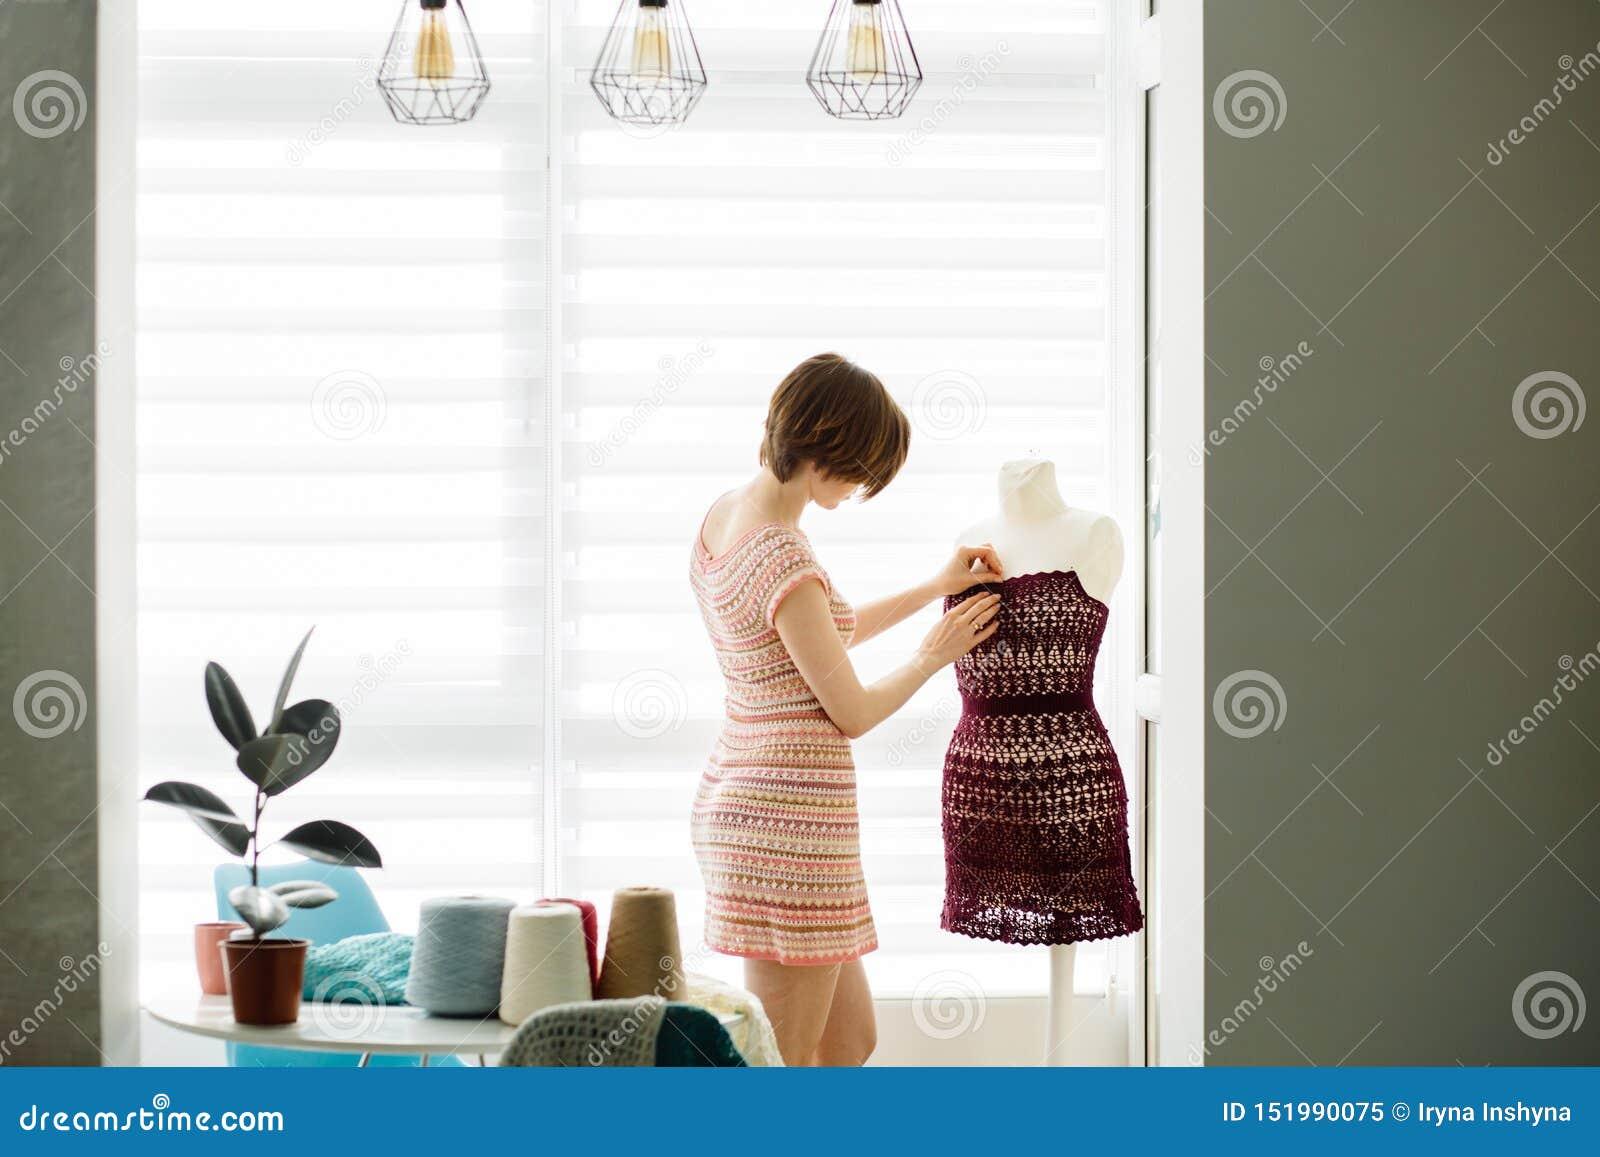 Young female clothing designer using dress dummy at cozy home interior, freelance lifestyle